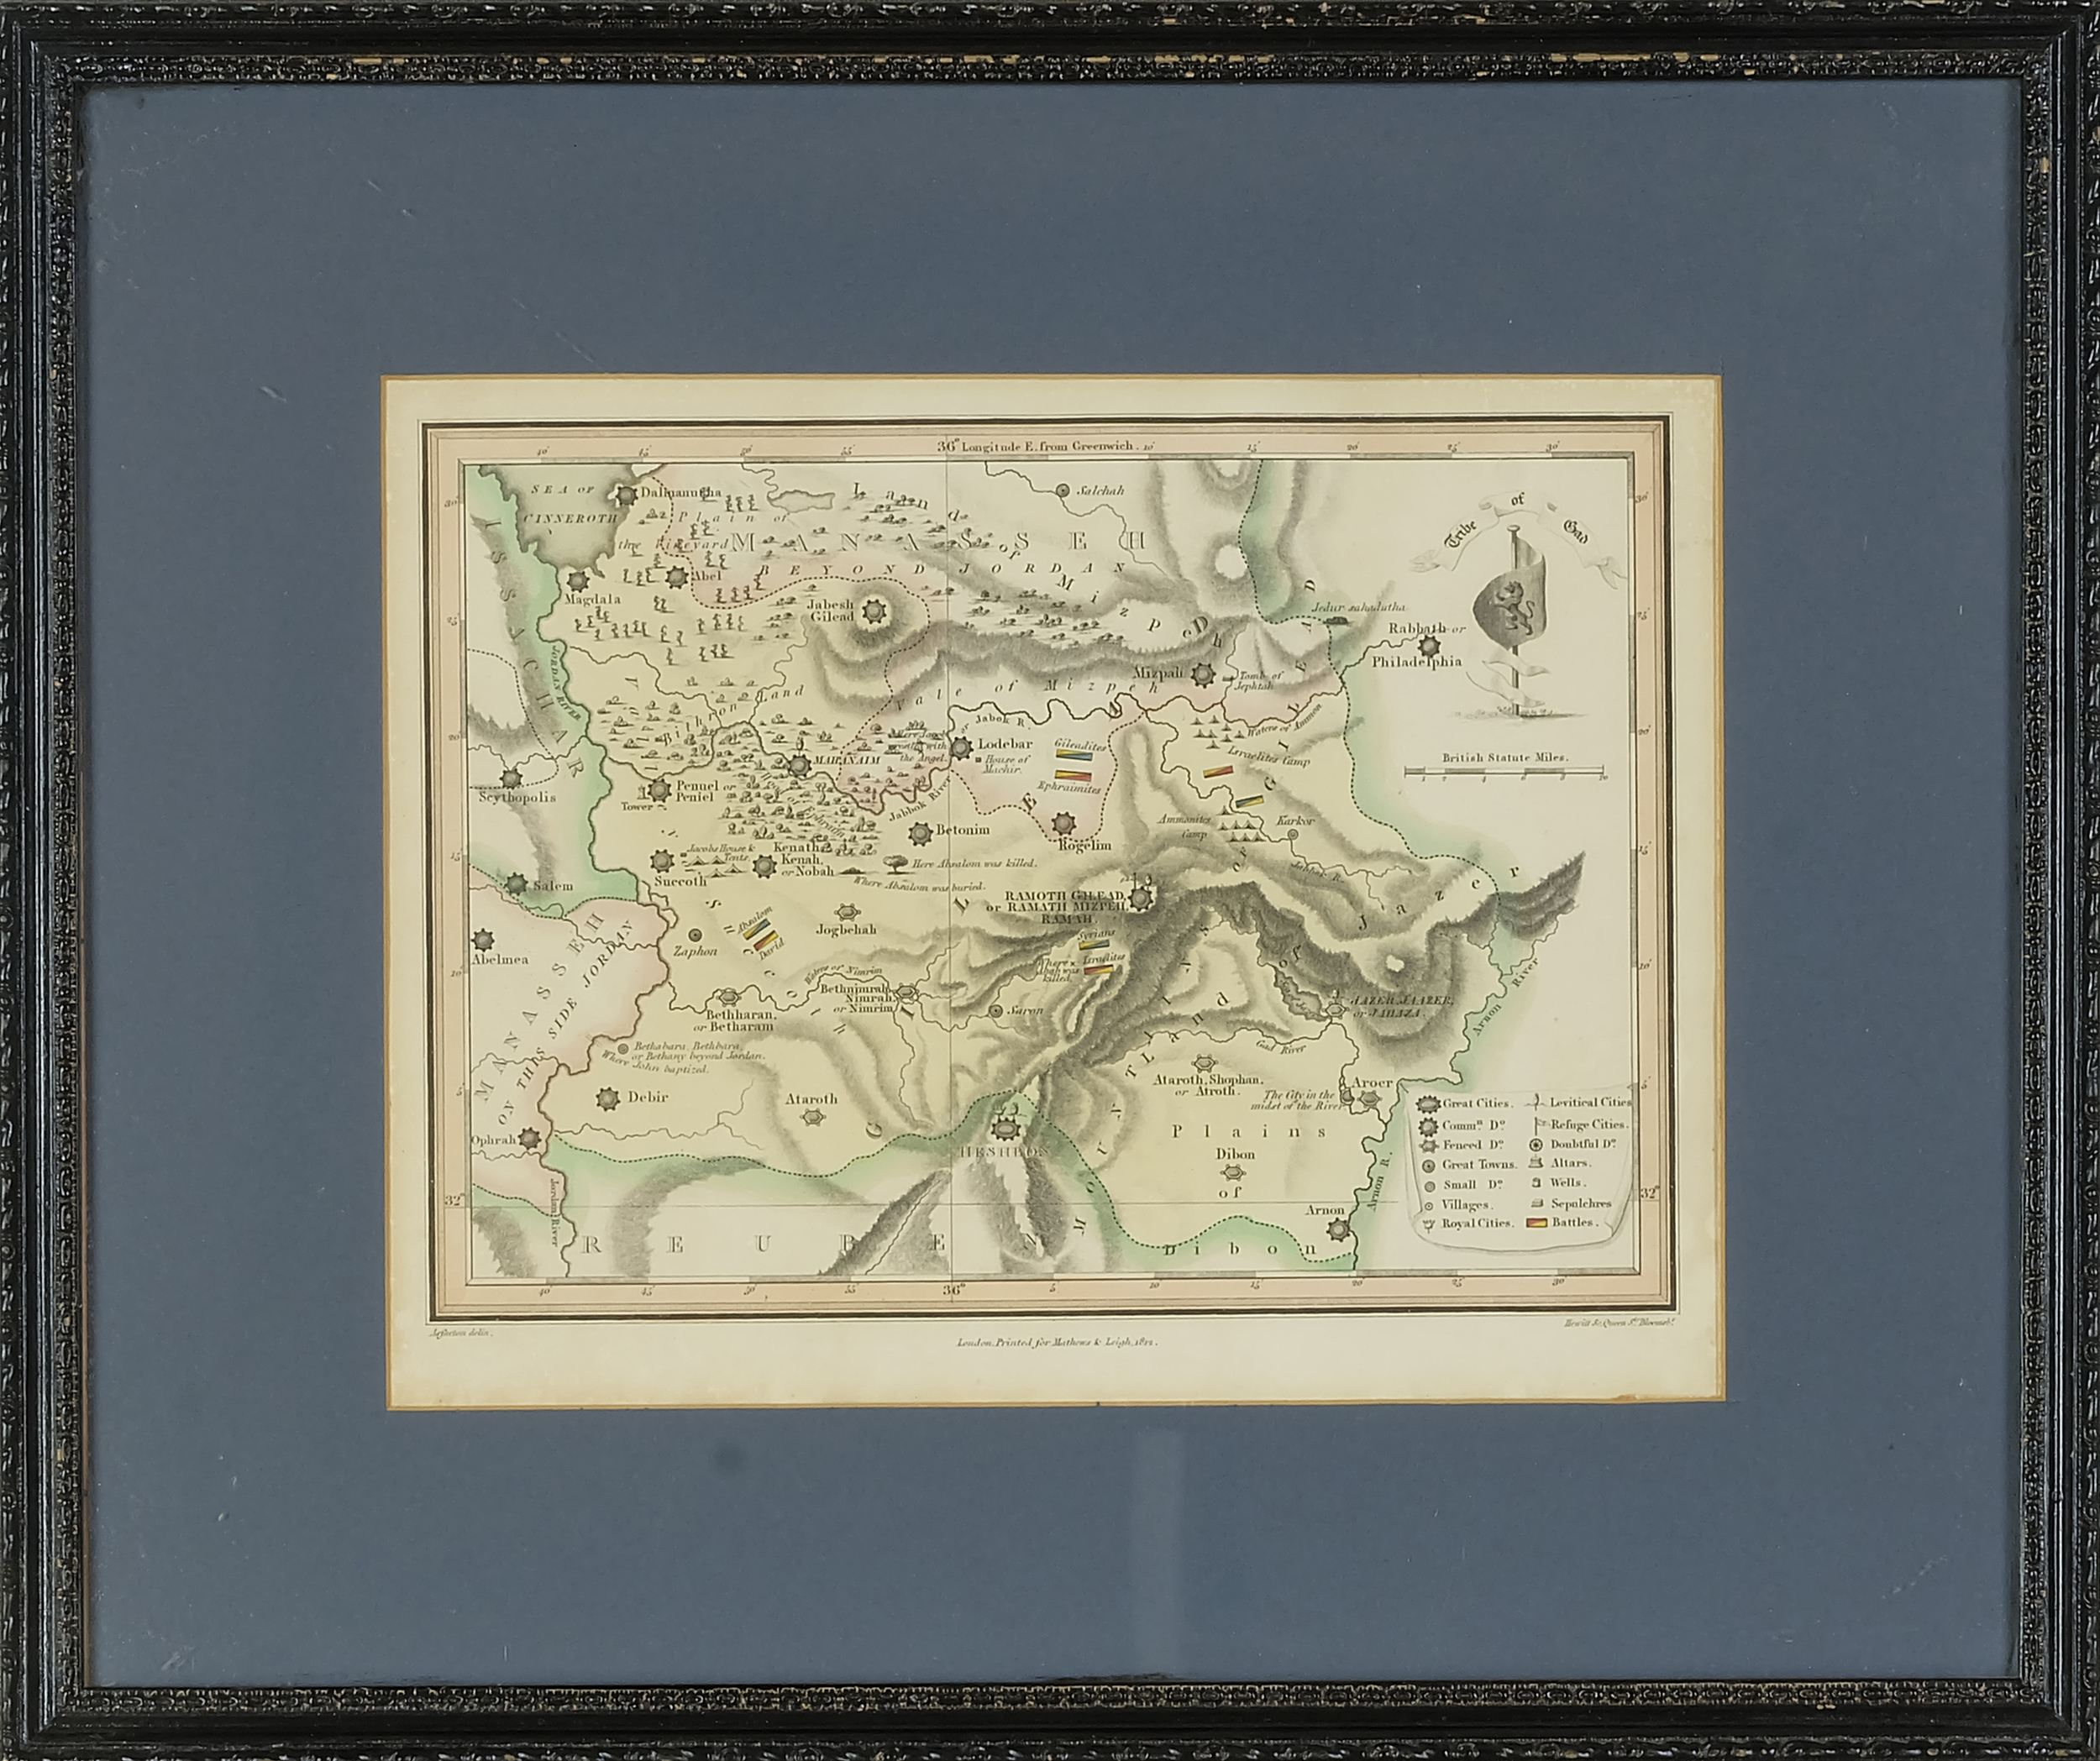 'Matthews and Leigh Antiquarian Hand-coloured Map of Jordan, 1812'